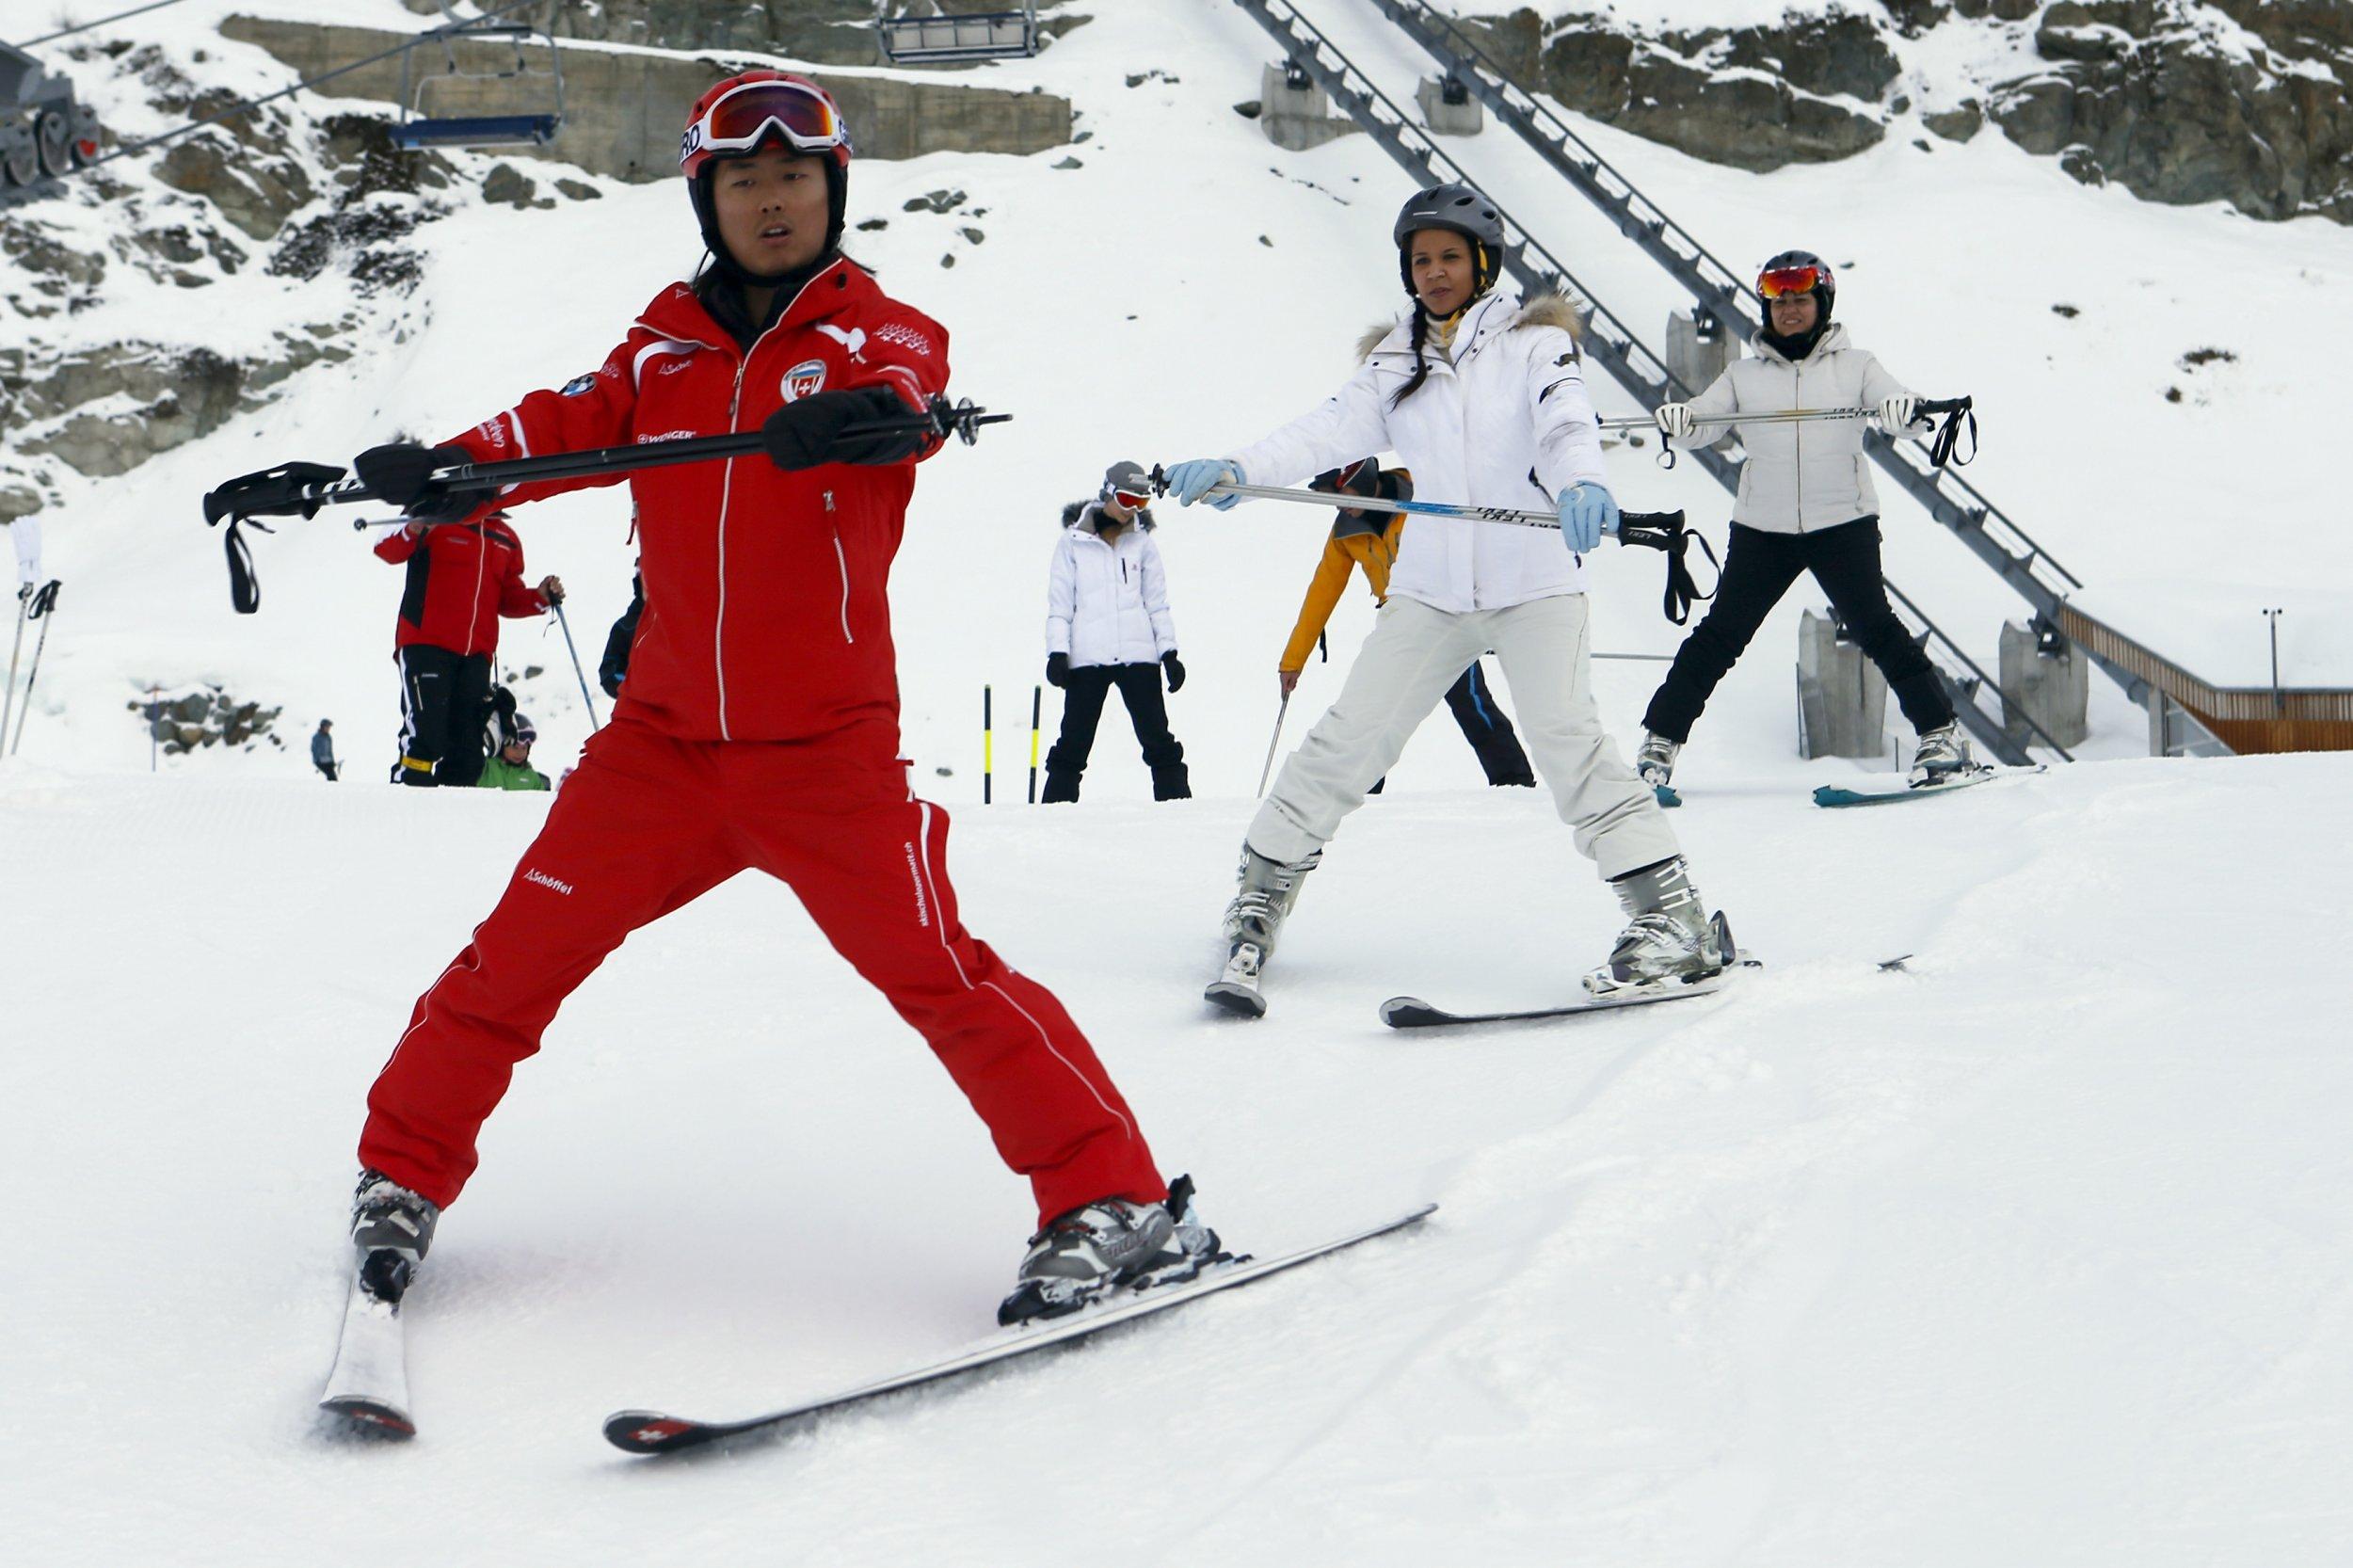 Chinese ski instructor